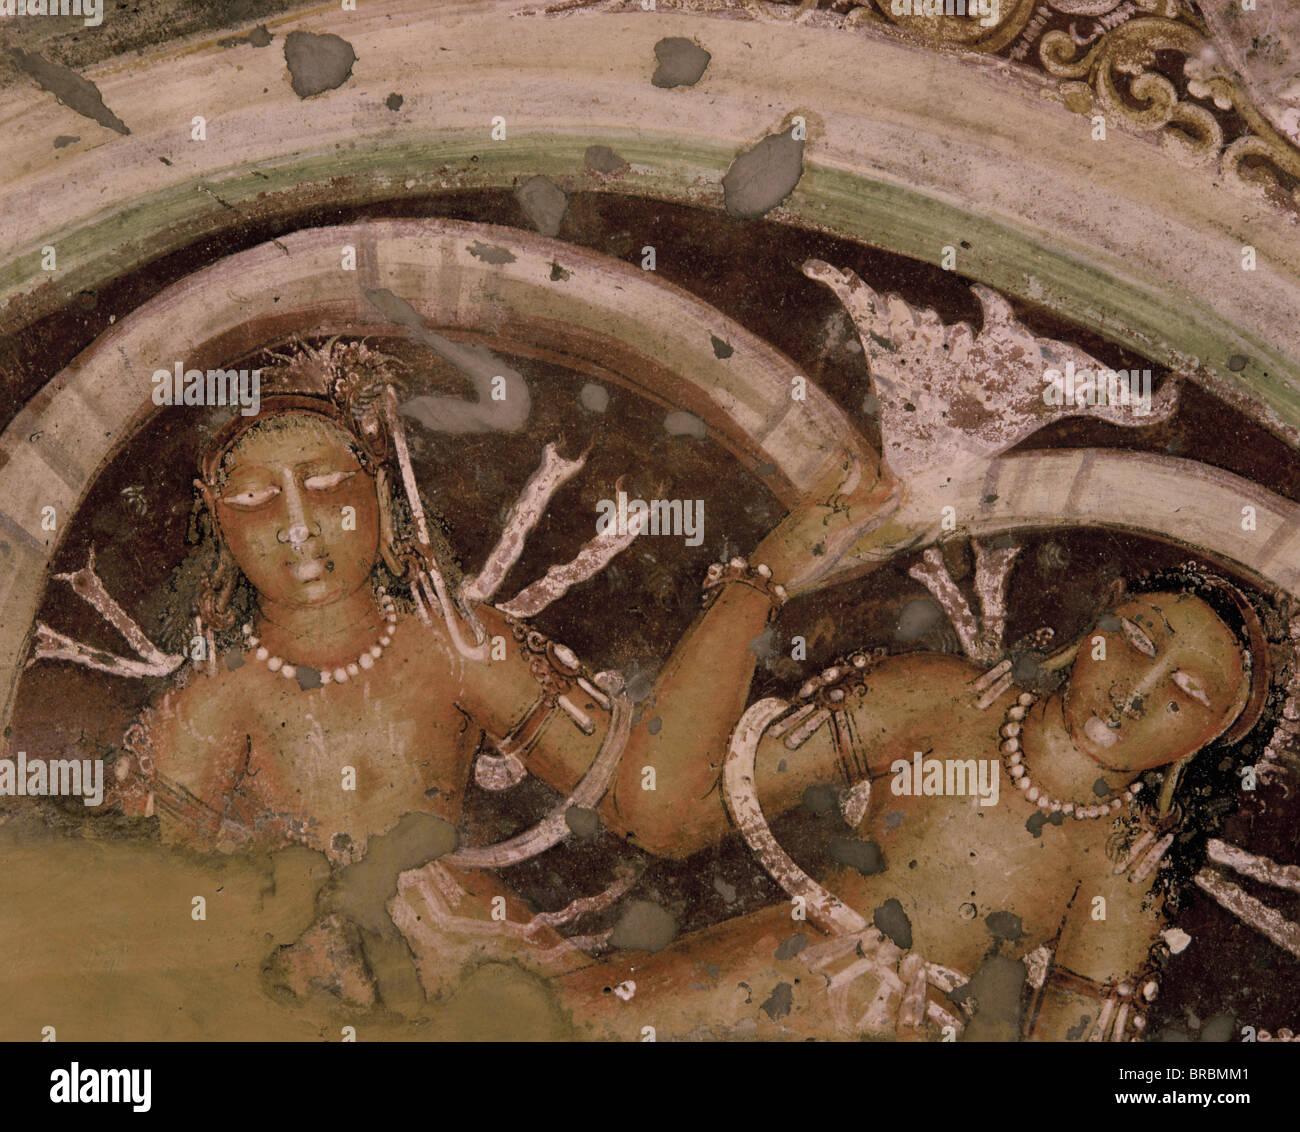 Detail of mural on ceiling inside Cave No.17, Ajanta, UNESCO World Heritage Site, Maharashtra, India - Stock Image